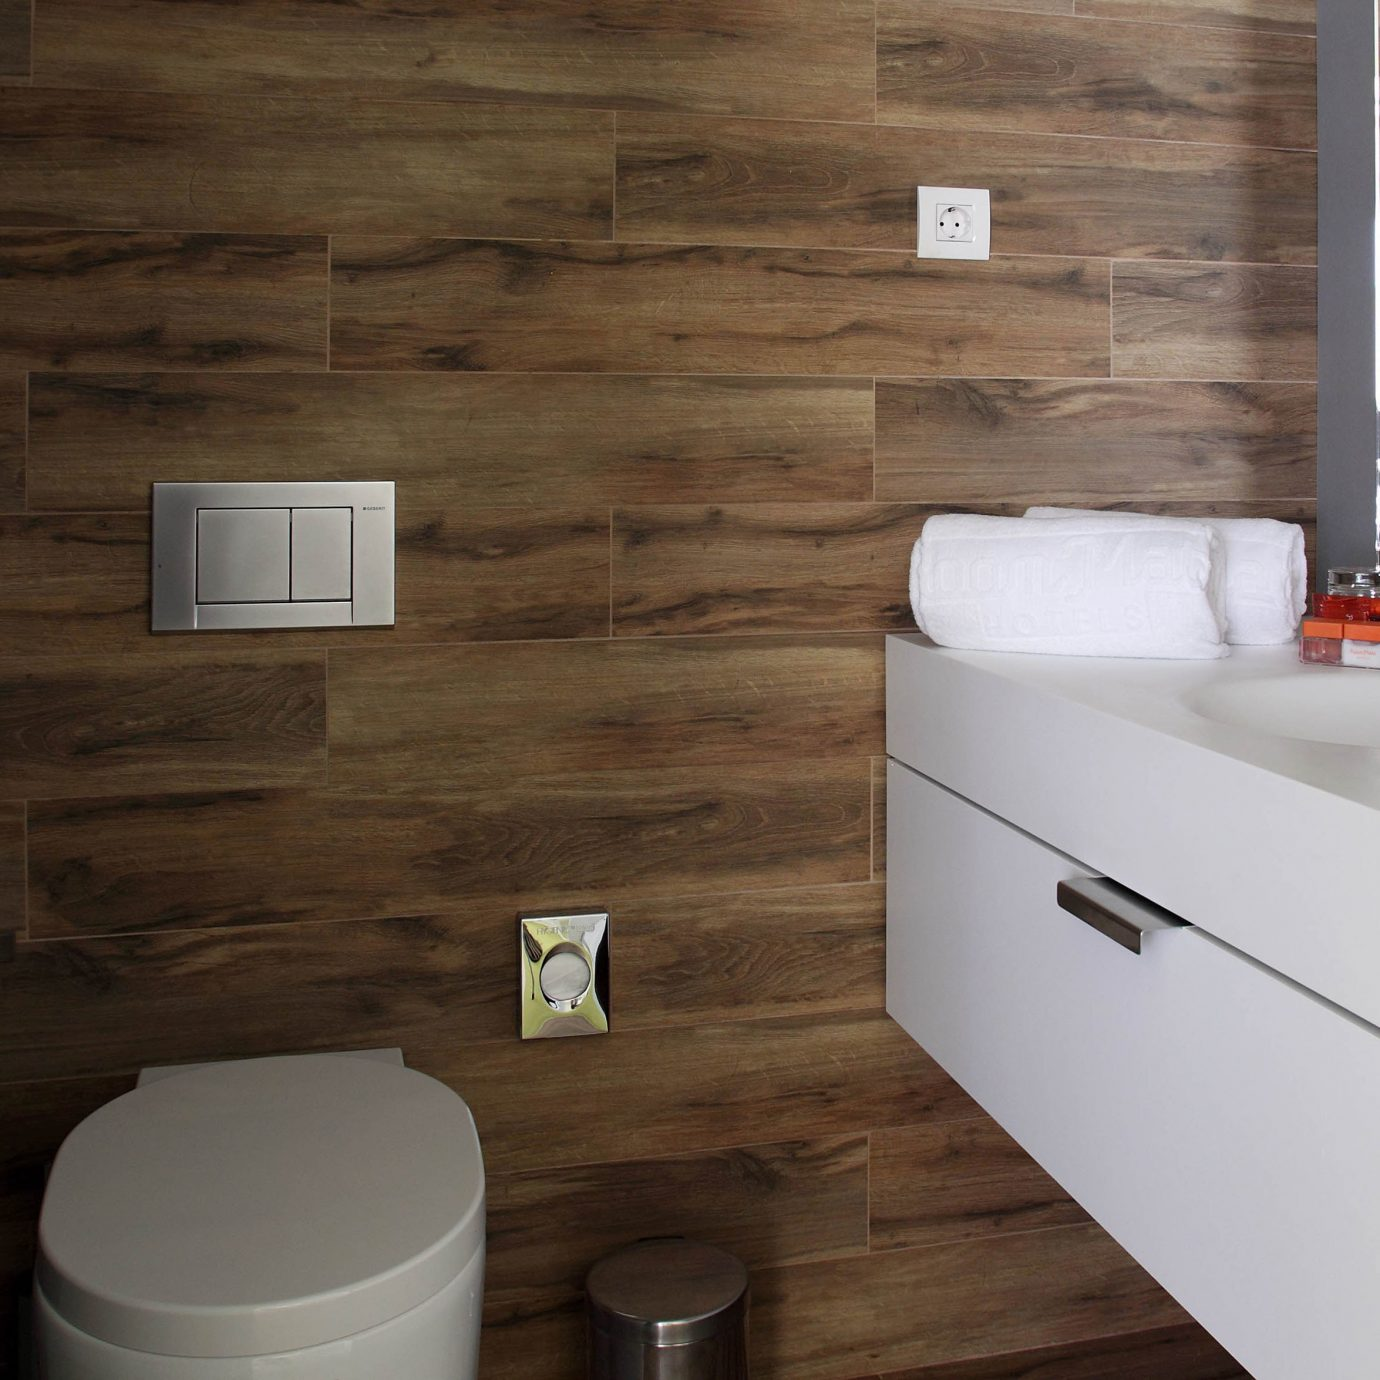 Bath Boutique Hip Modern bathroom property countertop hardwood home flooring Kitchen tile plumbing fixture cabinetry cottage